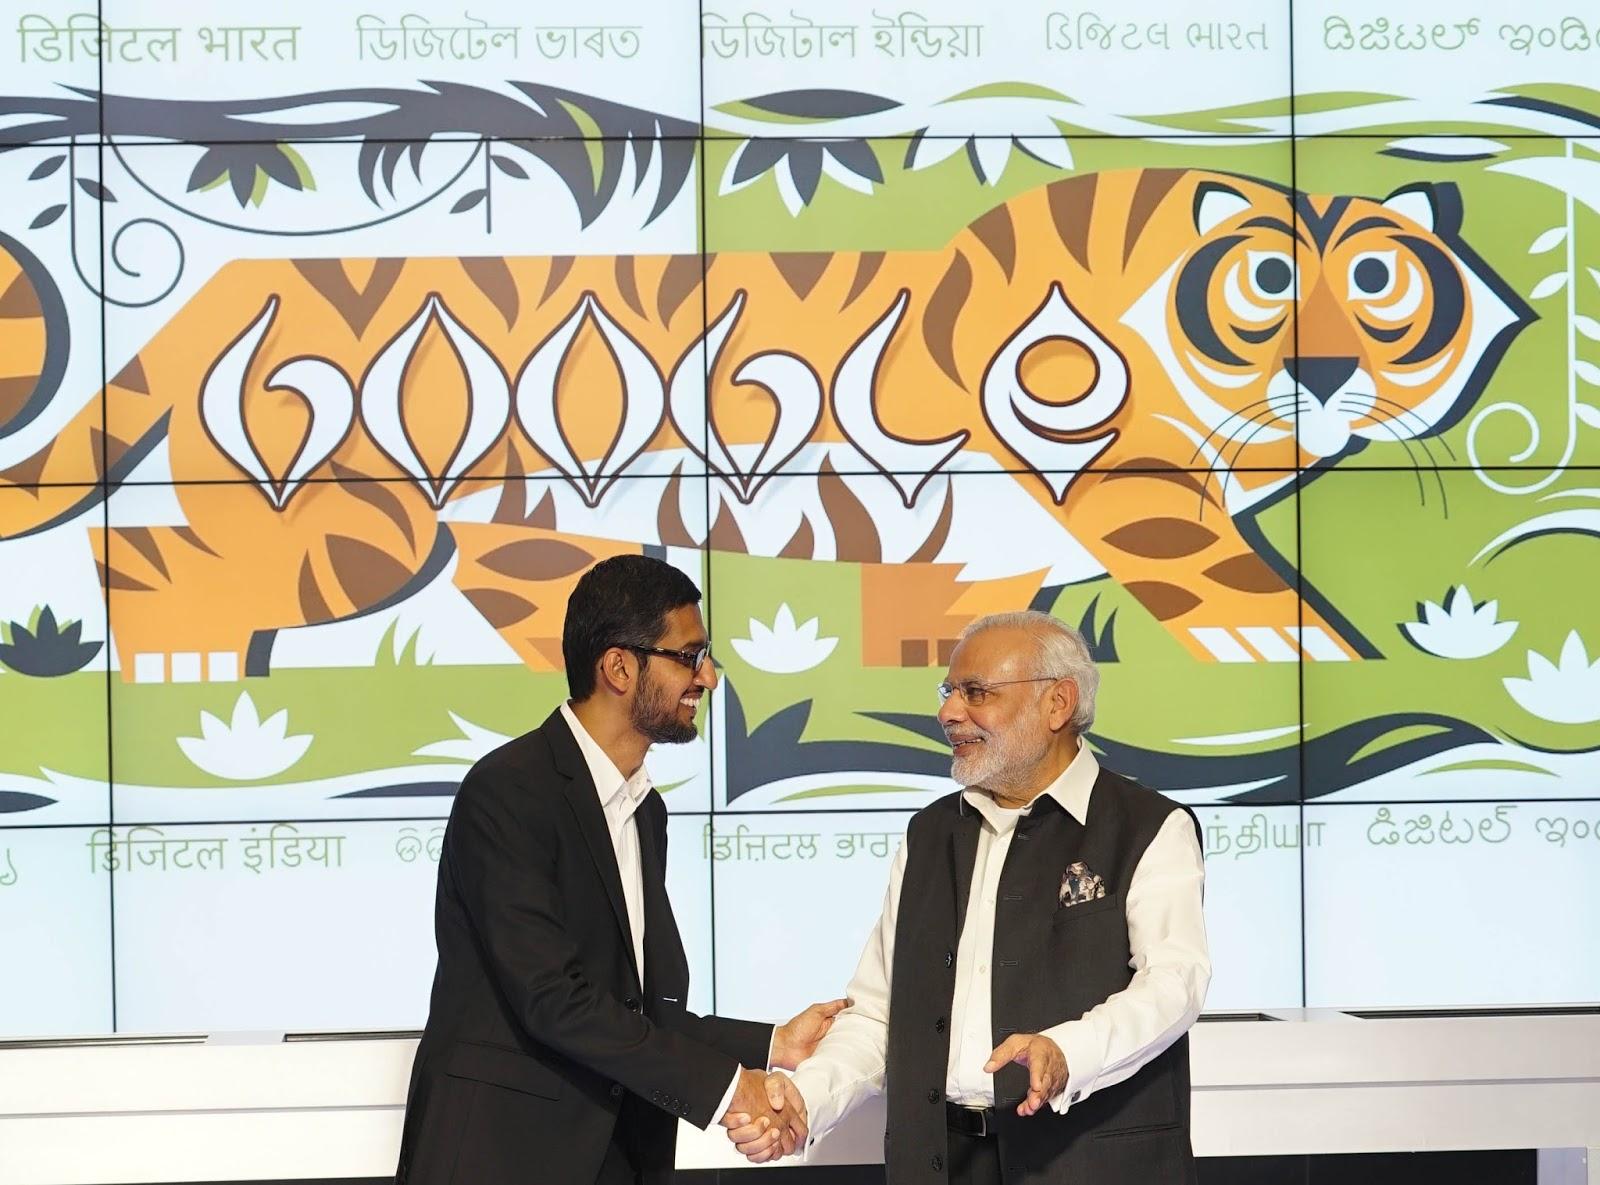 From L to R: CEO Google CEO Sundar Pichai and Prime Minister Narendra Modi at the Googleplex today.